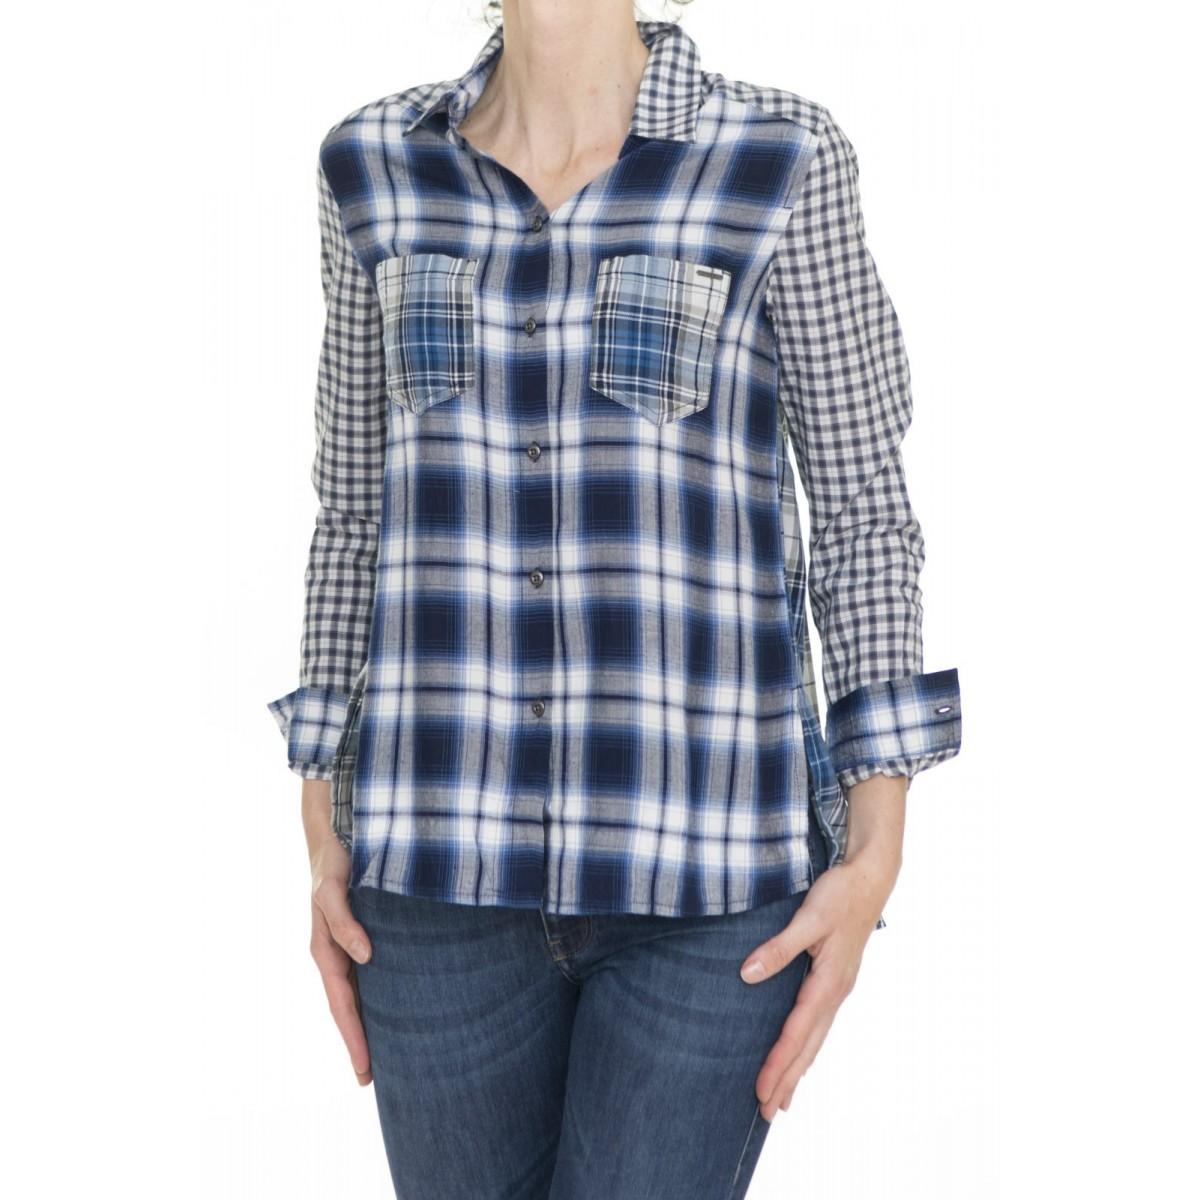 Camicia donna Diesel - C-eve camicia quadri